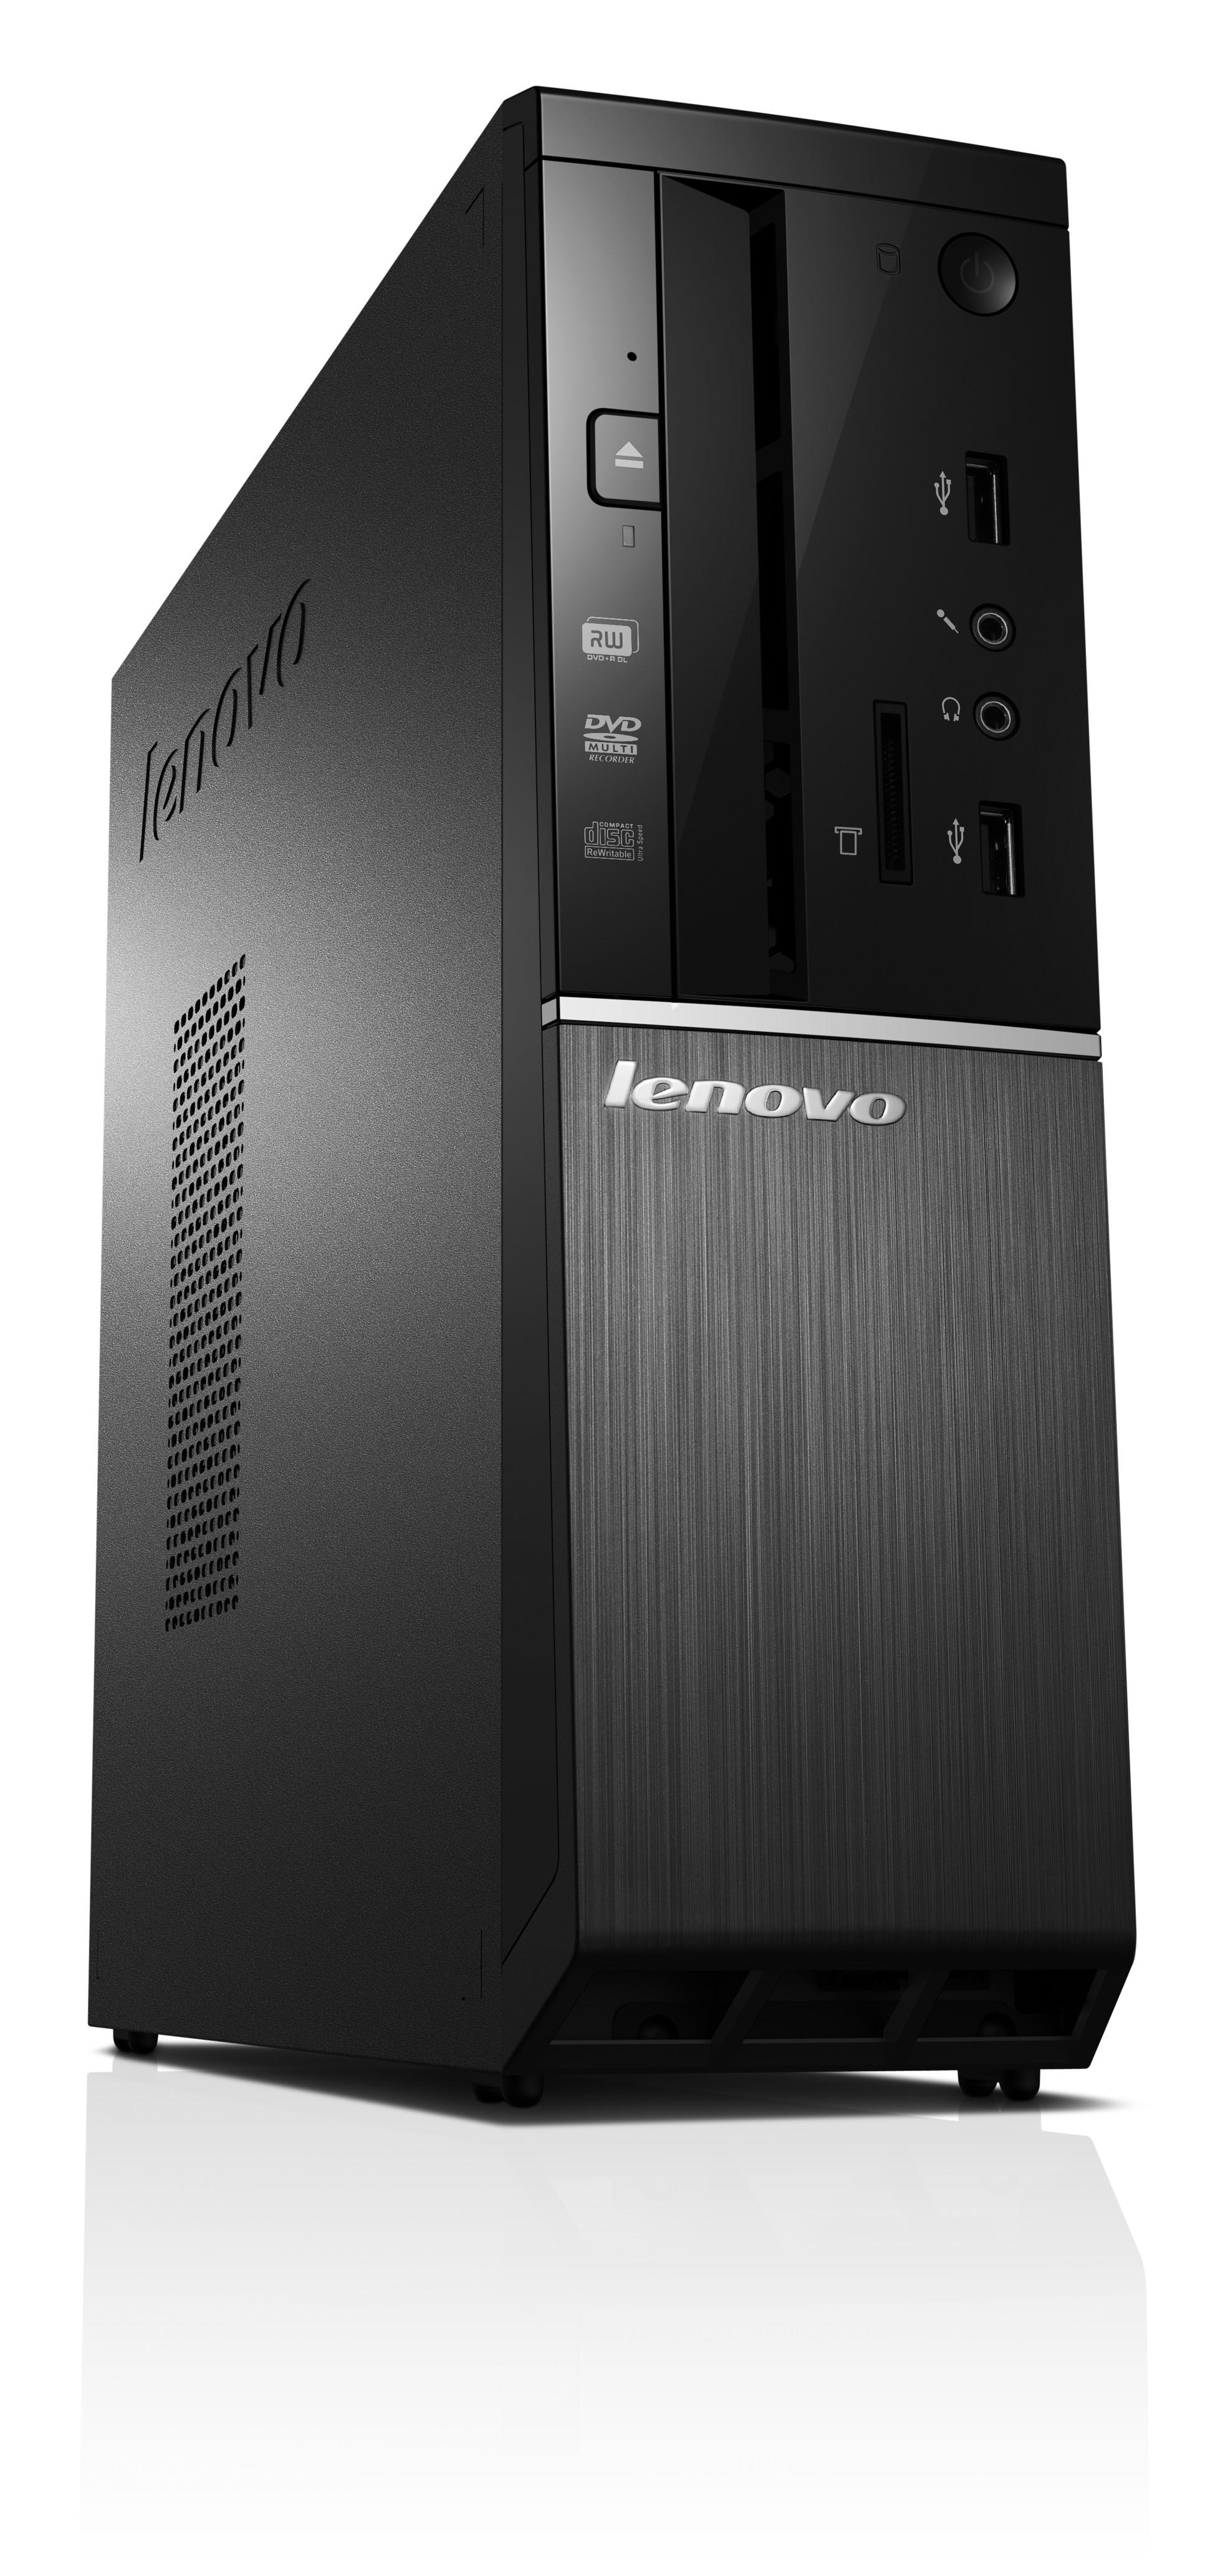 Lenovo IdeaCentre 300S Pentium-DC G3260 3,30GHz/4GB/1TB/DVD-RW/WIN10 90F1001ECK